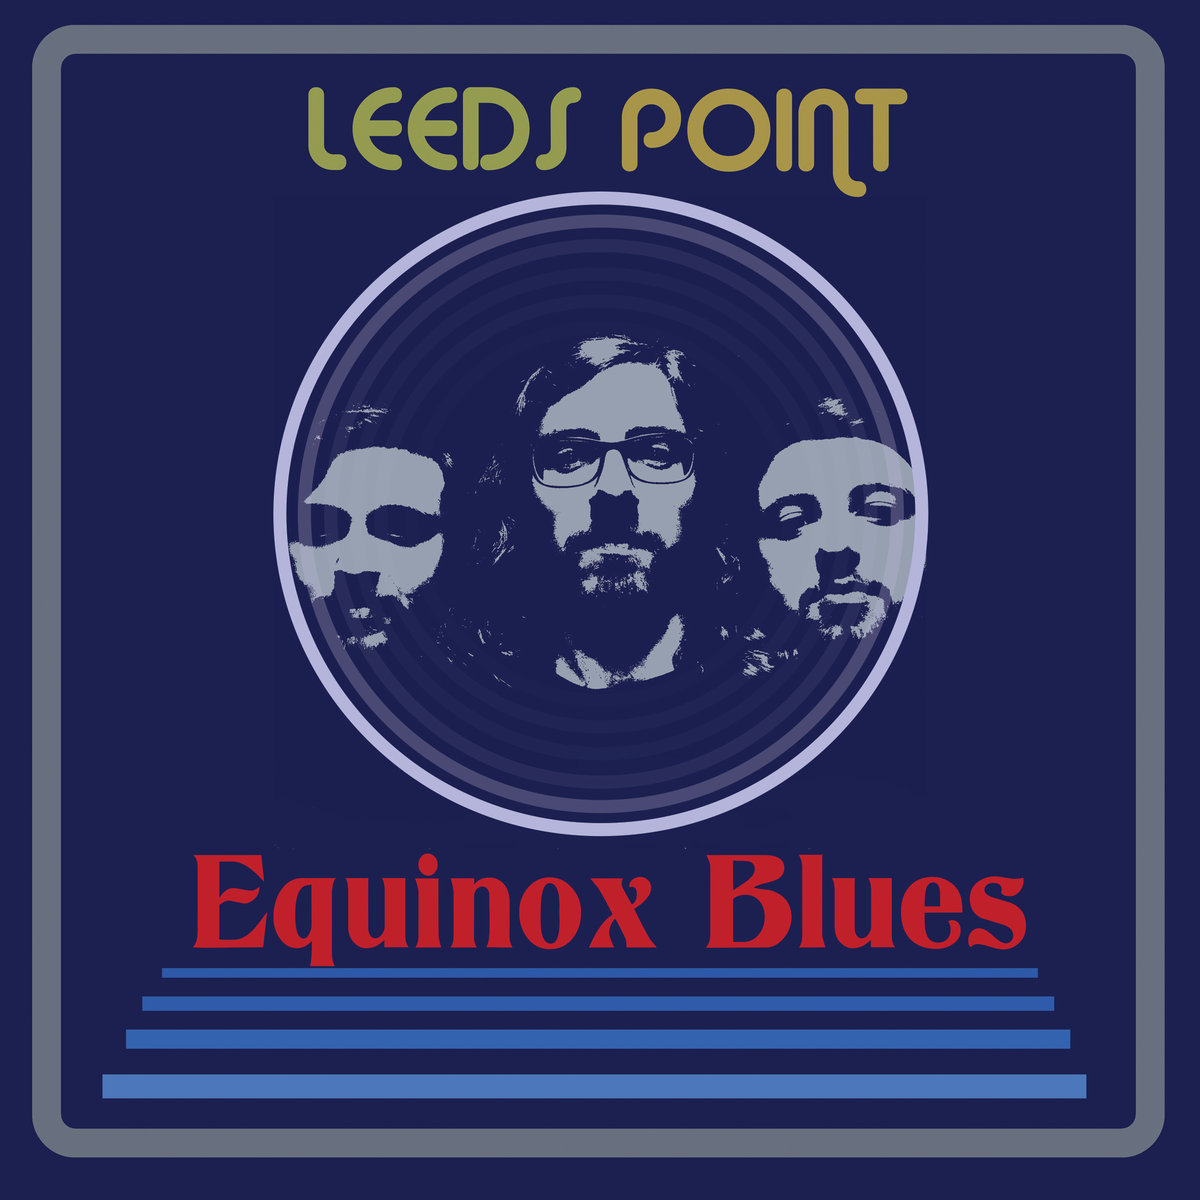 Leeds Point Equinox Blues